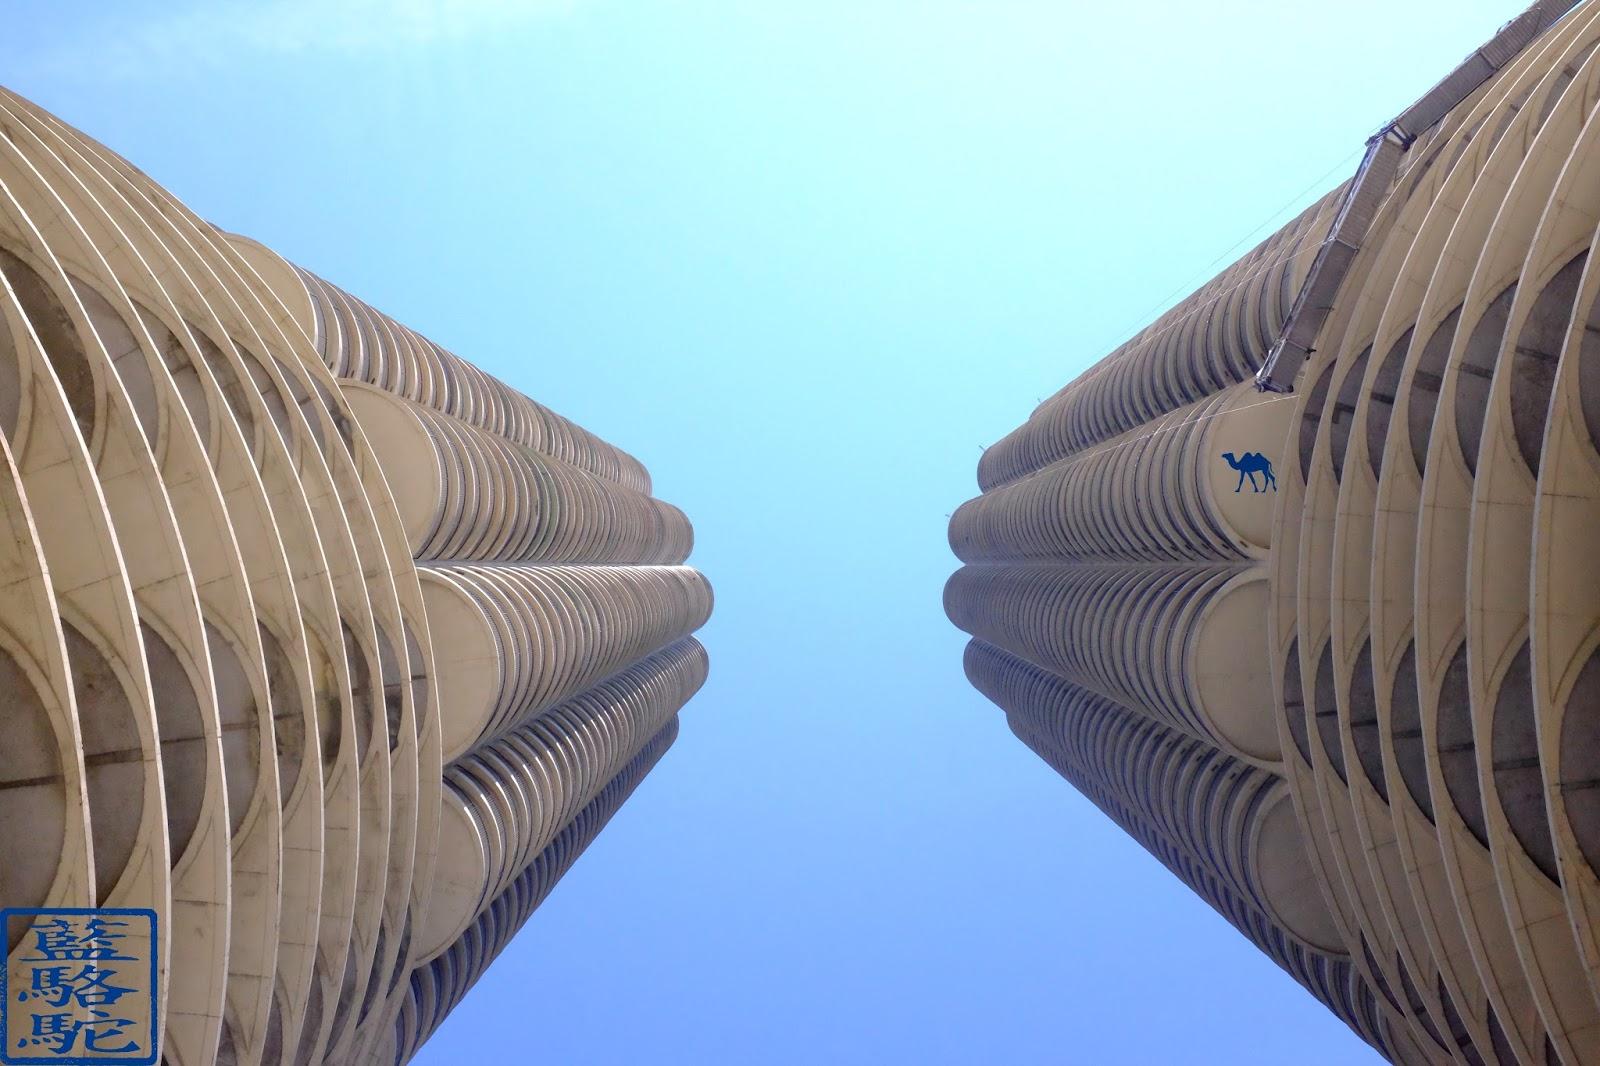 Le Chameau Bleu - Blog Voyage Chicago USA -  Skycrapper de Chicago Illinois USA